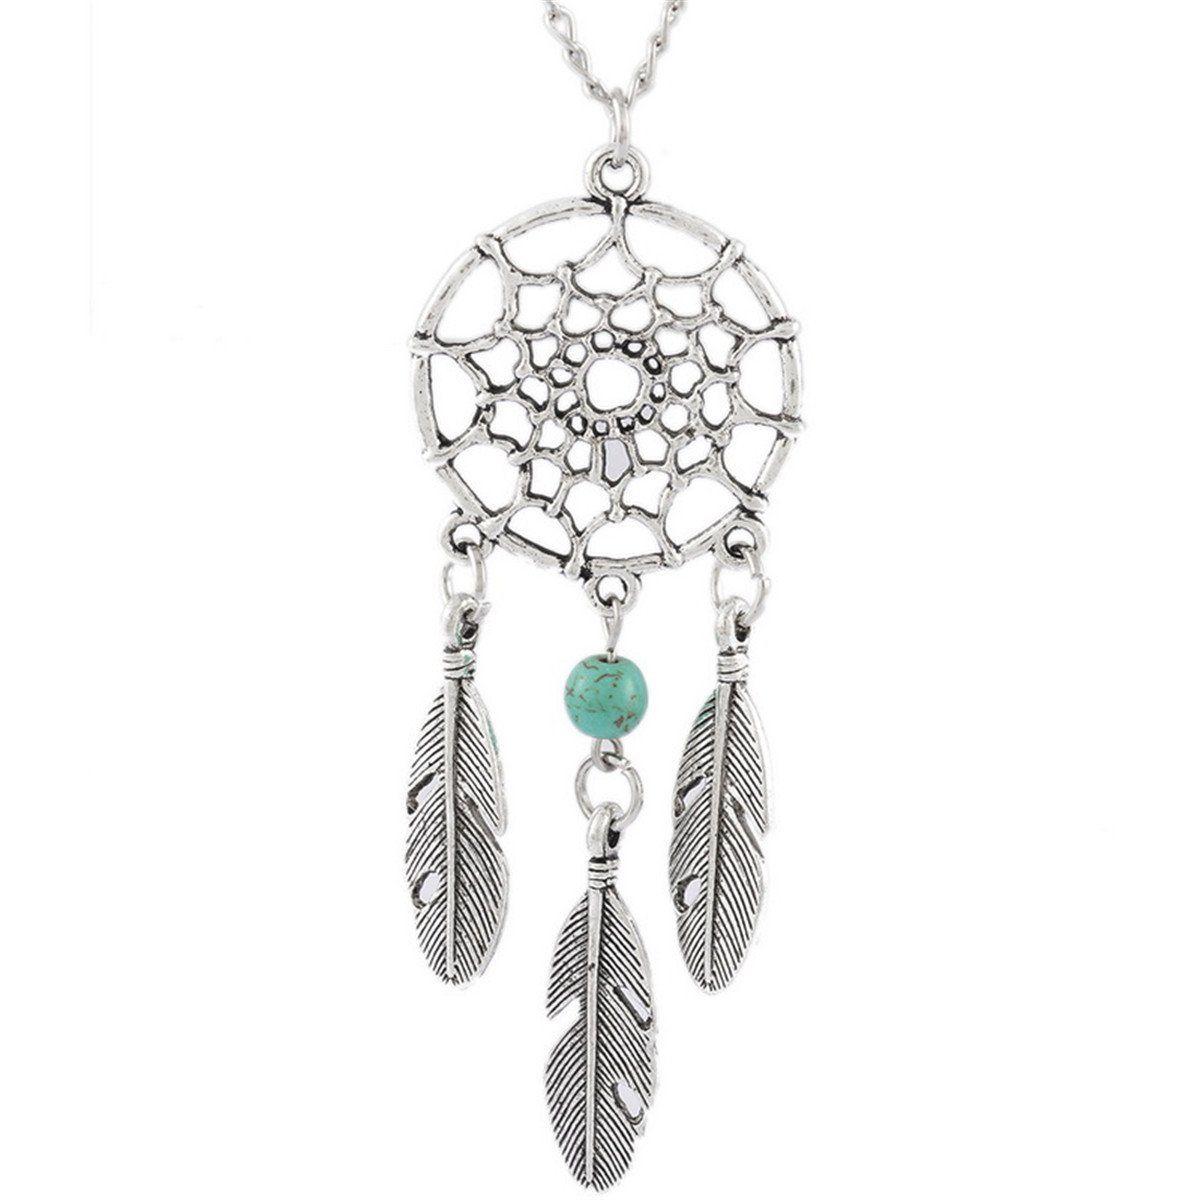 2019 Lily Fashion Dream Catcher Pendant Chain Necklace